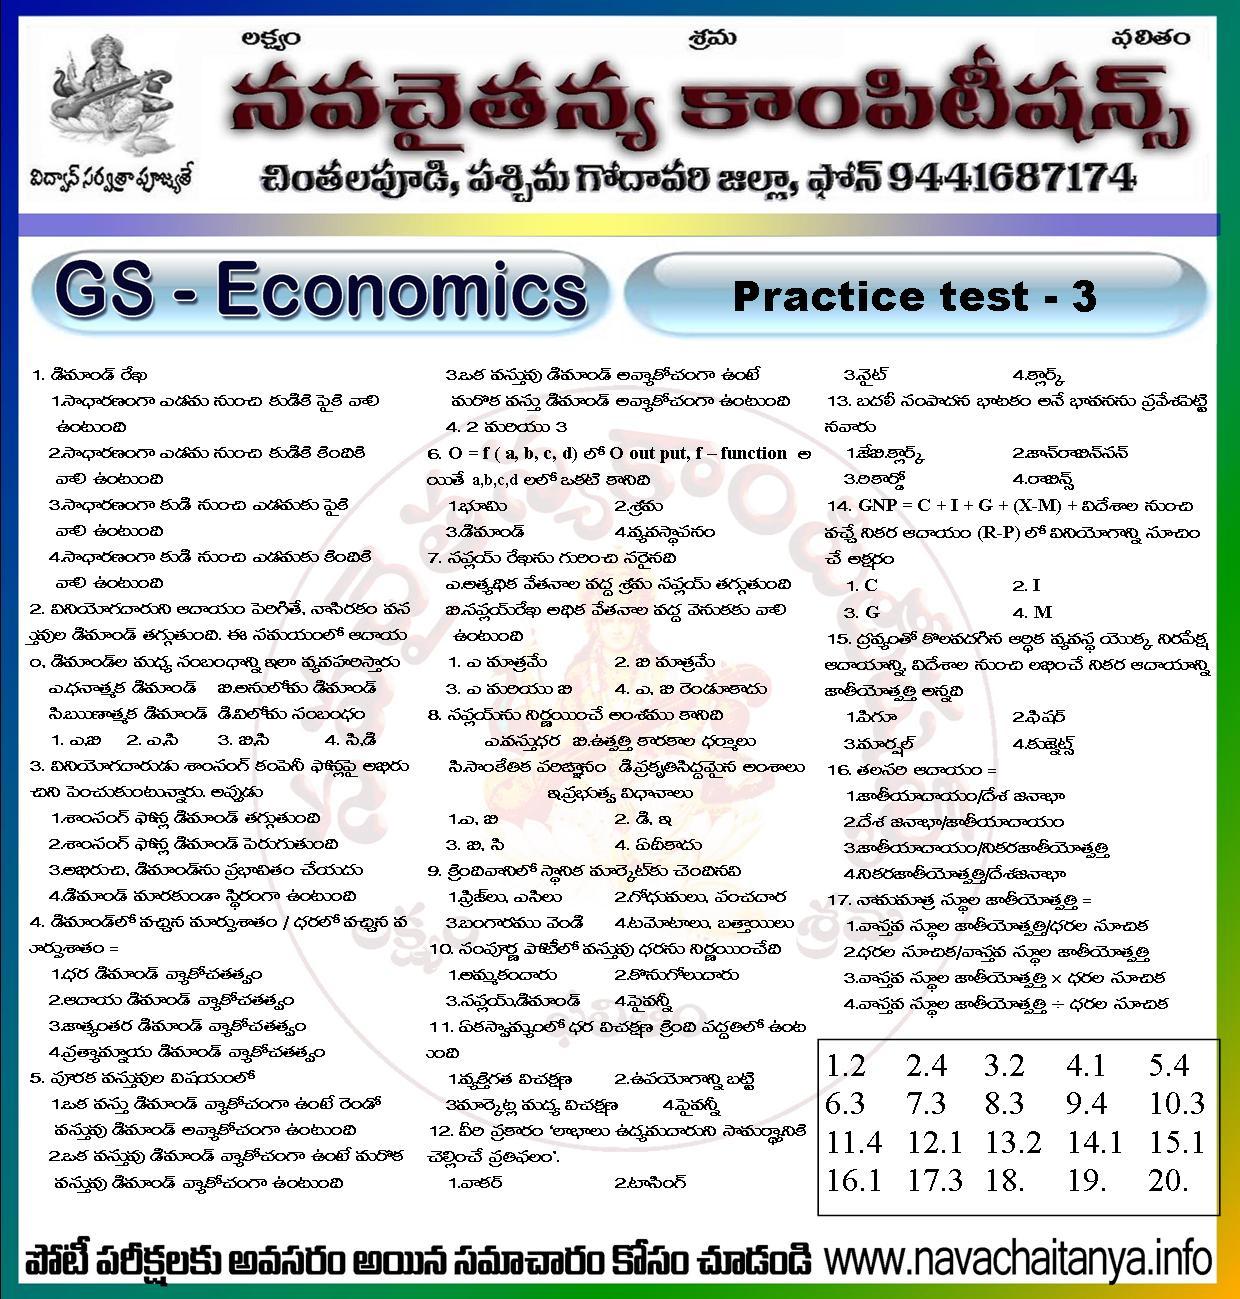 General Studies - INDIAN ECONOMY - Practice test - 3